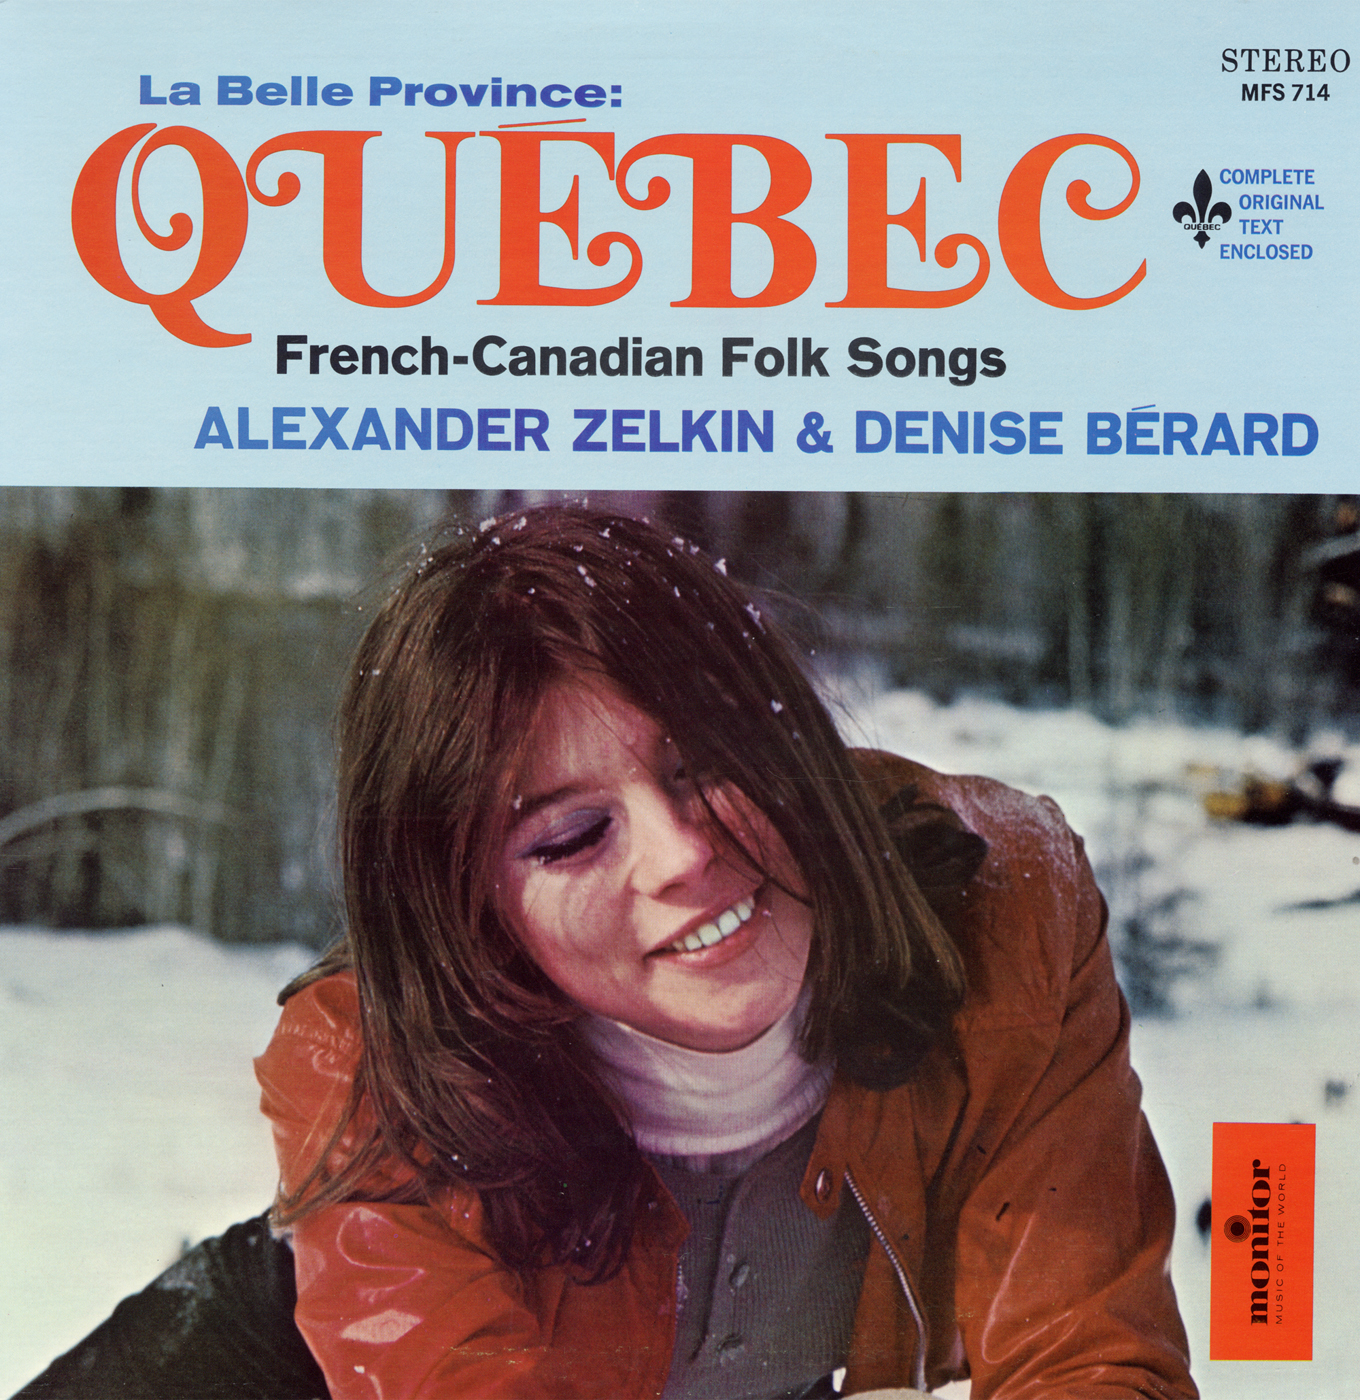 La Belle Province Québec: French-Canadian Folk Songs | Smithsonian